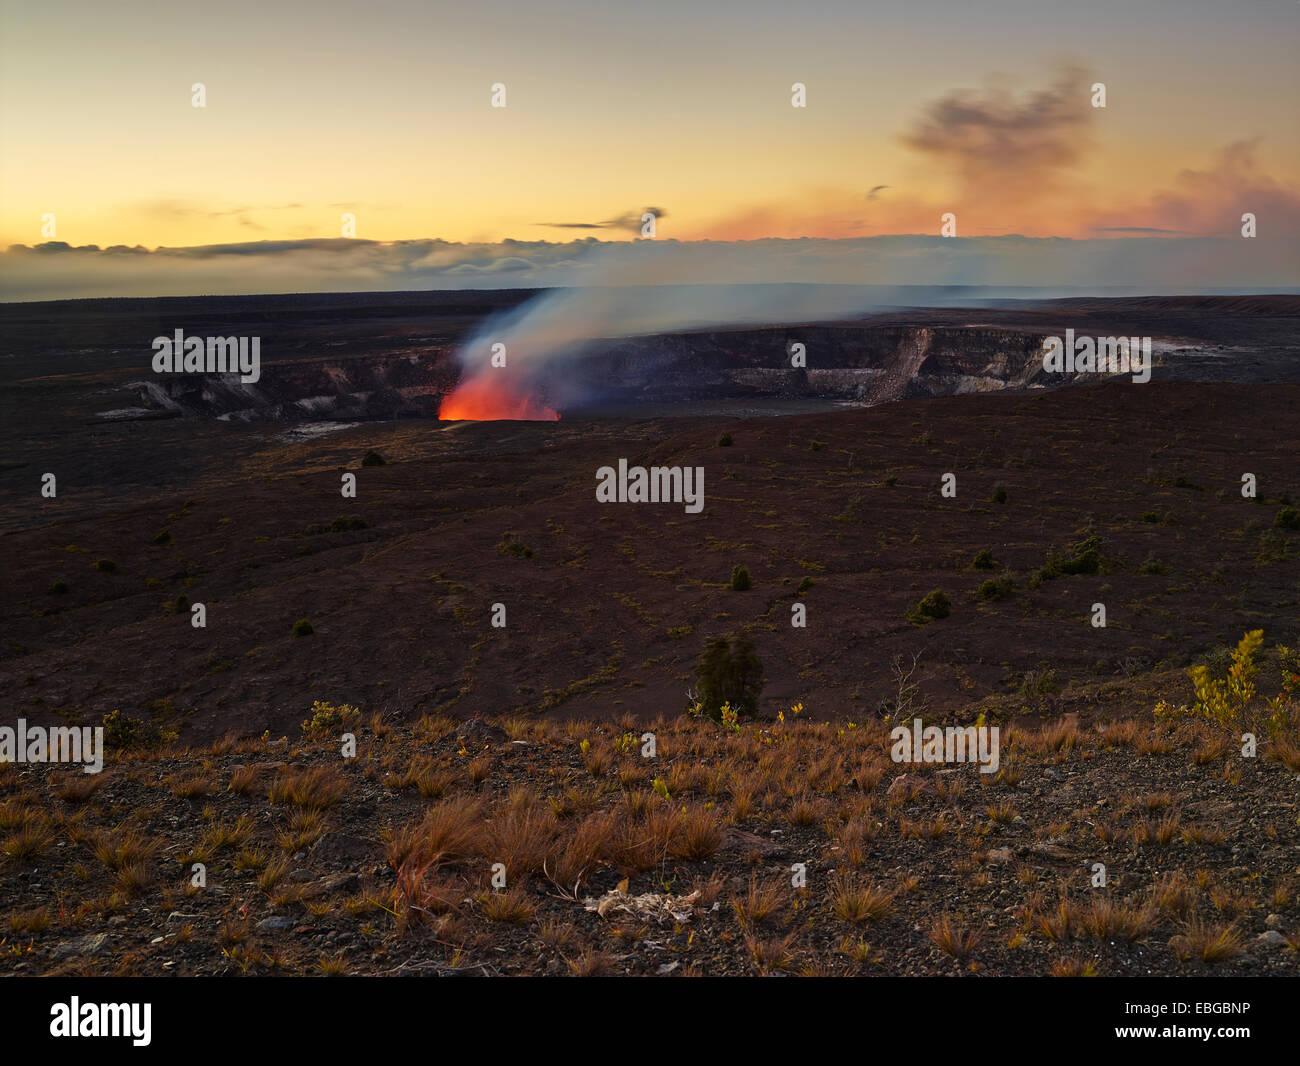 Halema'uma'u or Halemaumau crater, Kilauea crater, volcanic eruption, lava, red hot lava flow, Hawaiʻi-Volcanoes - Stock Image